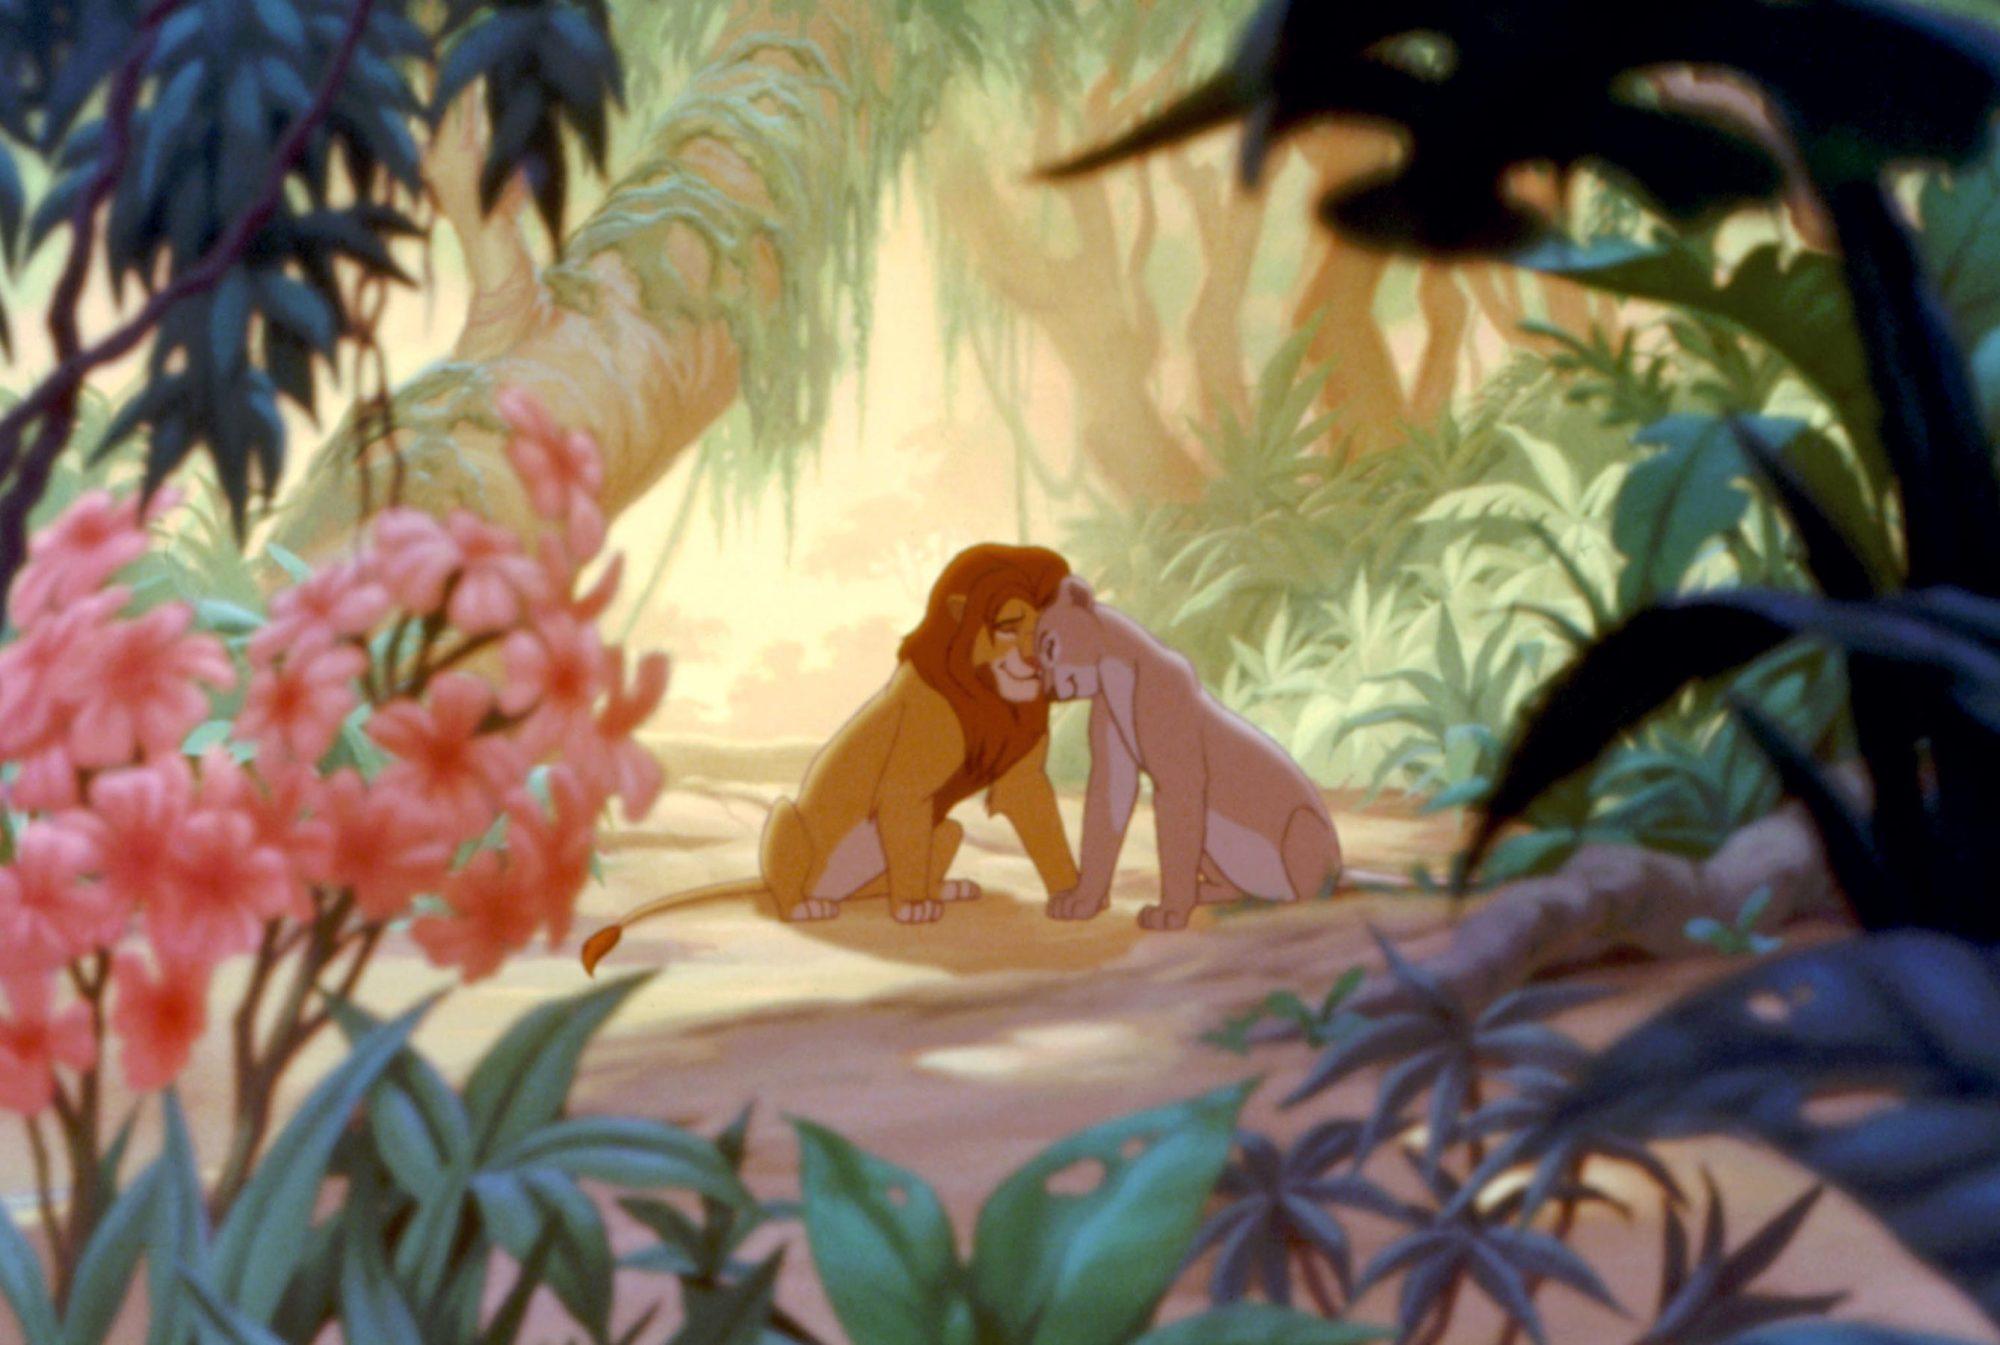 THE LION KING, Simba, voice of Matthew Broderick, Nala, voice of Moira Kelly, 1994. ©Buena Vista Pic